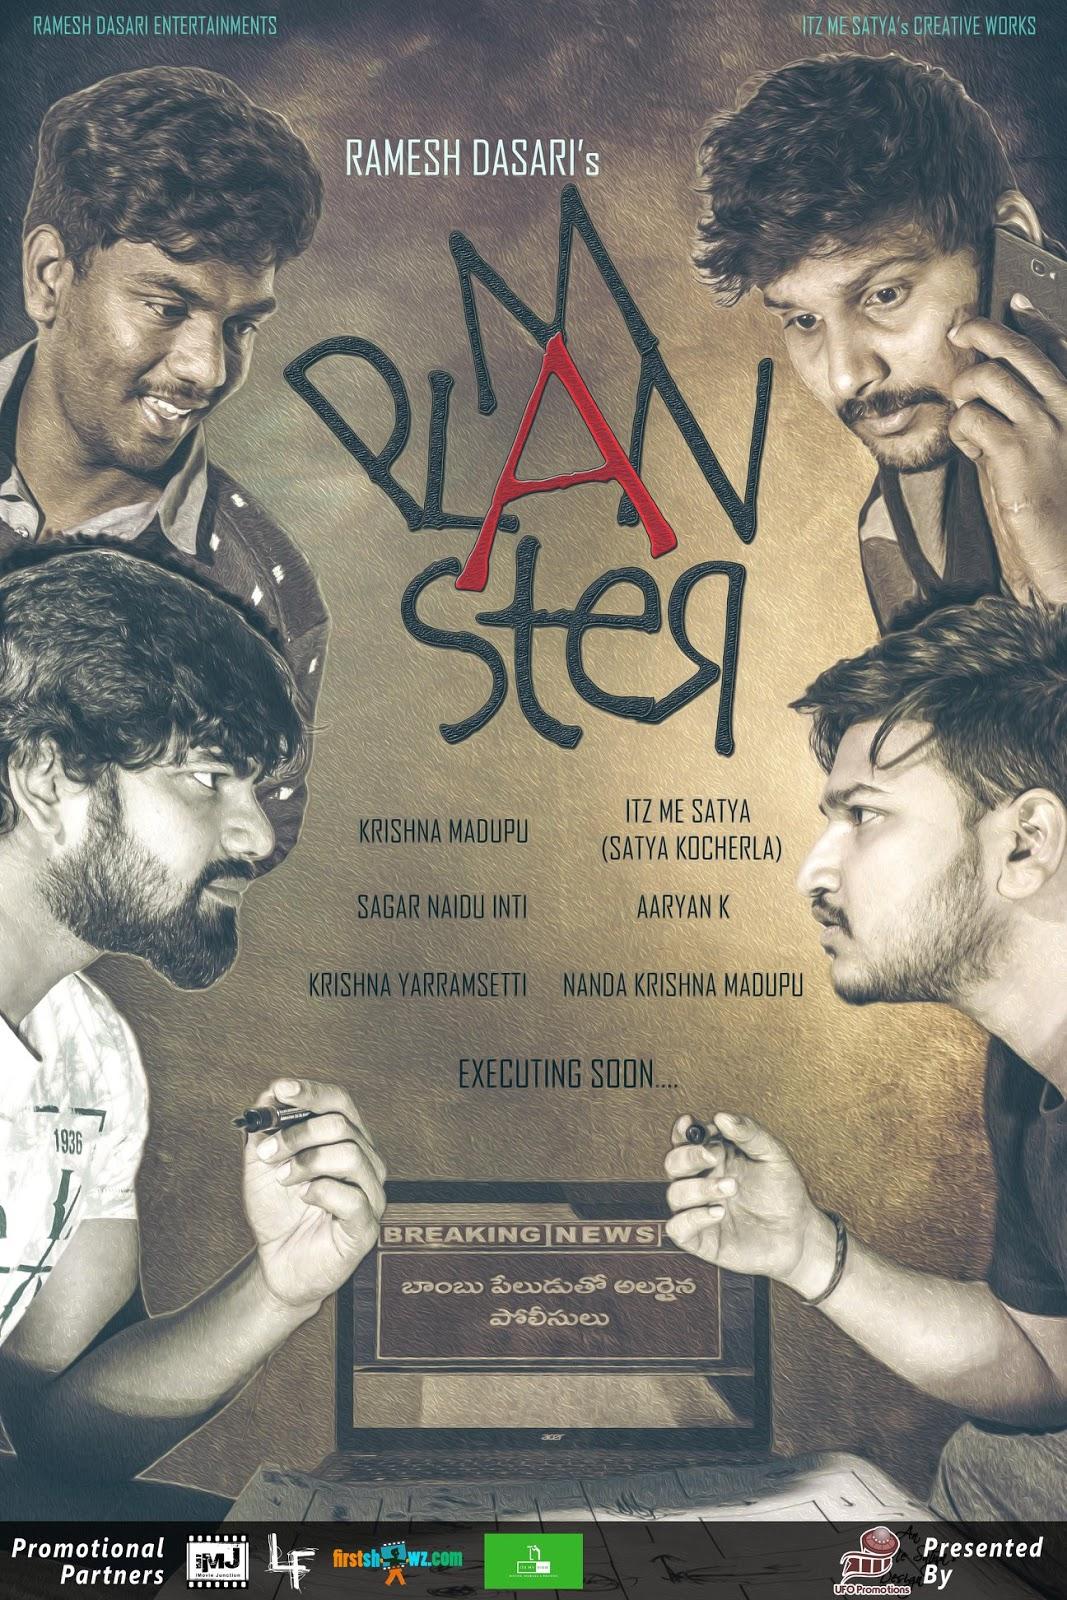 Master Plan Short Film Poster Latest Movie Updates Movie Promotions Branding Online And Offline Digital Marketing Services